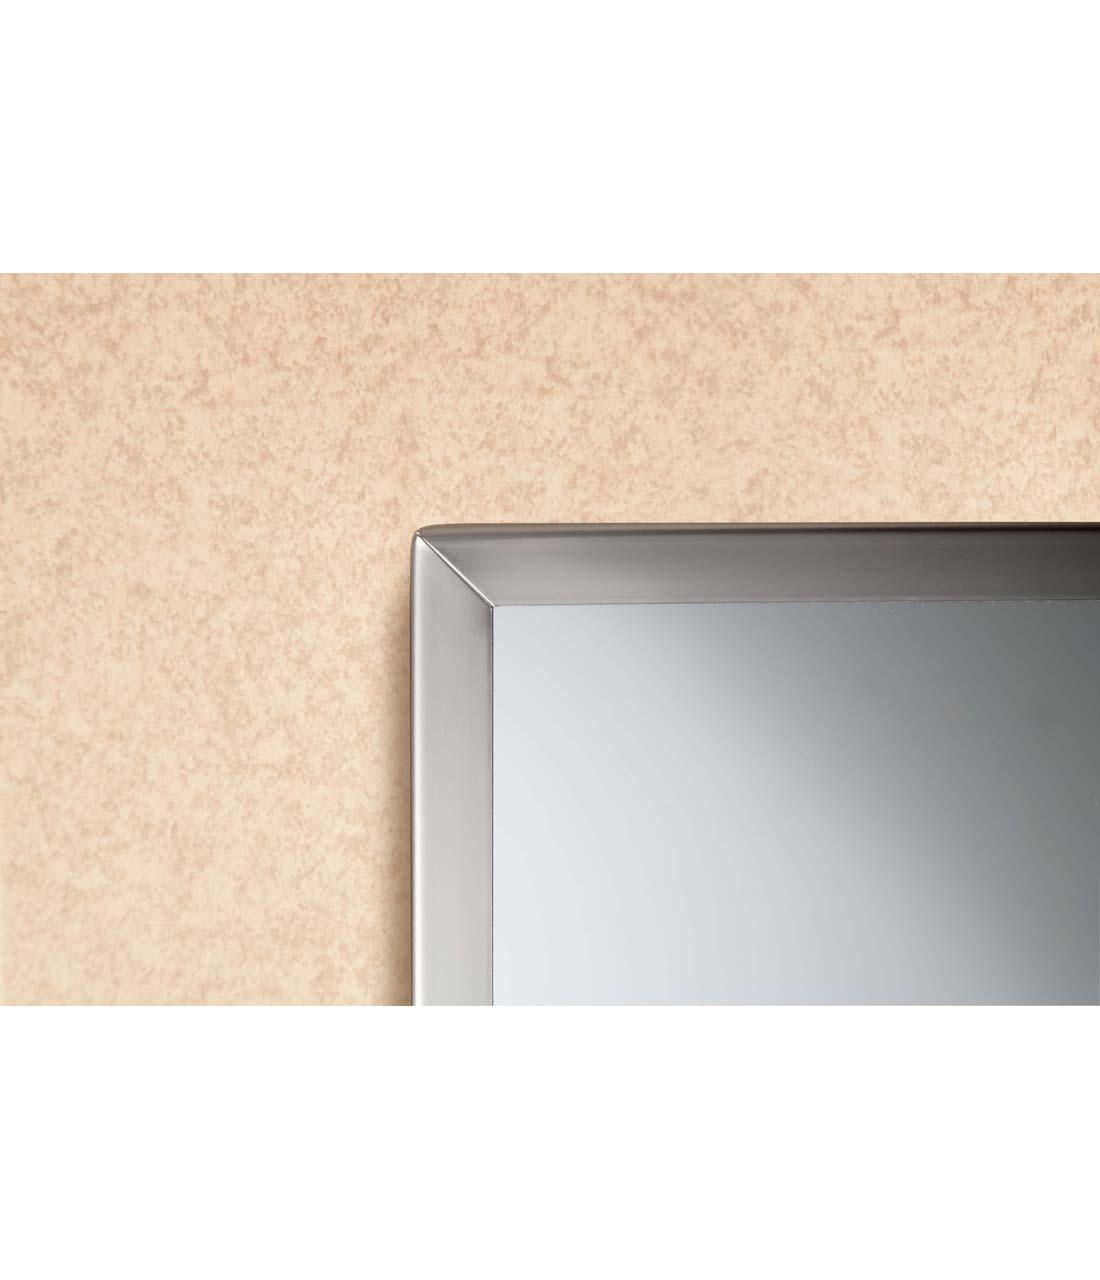 "Bobrick B-1658 2436 24"" x 36"" Tempered Glass Channel Frame Mirror"